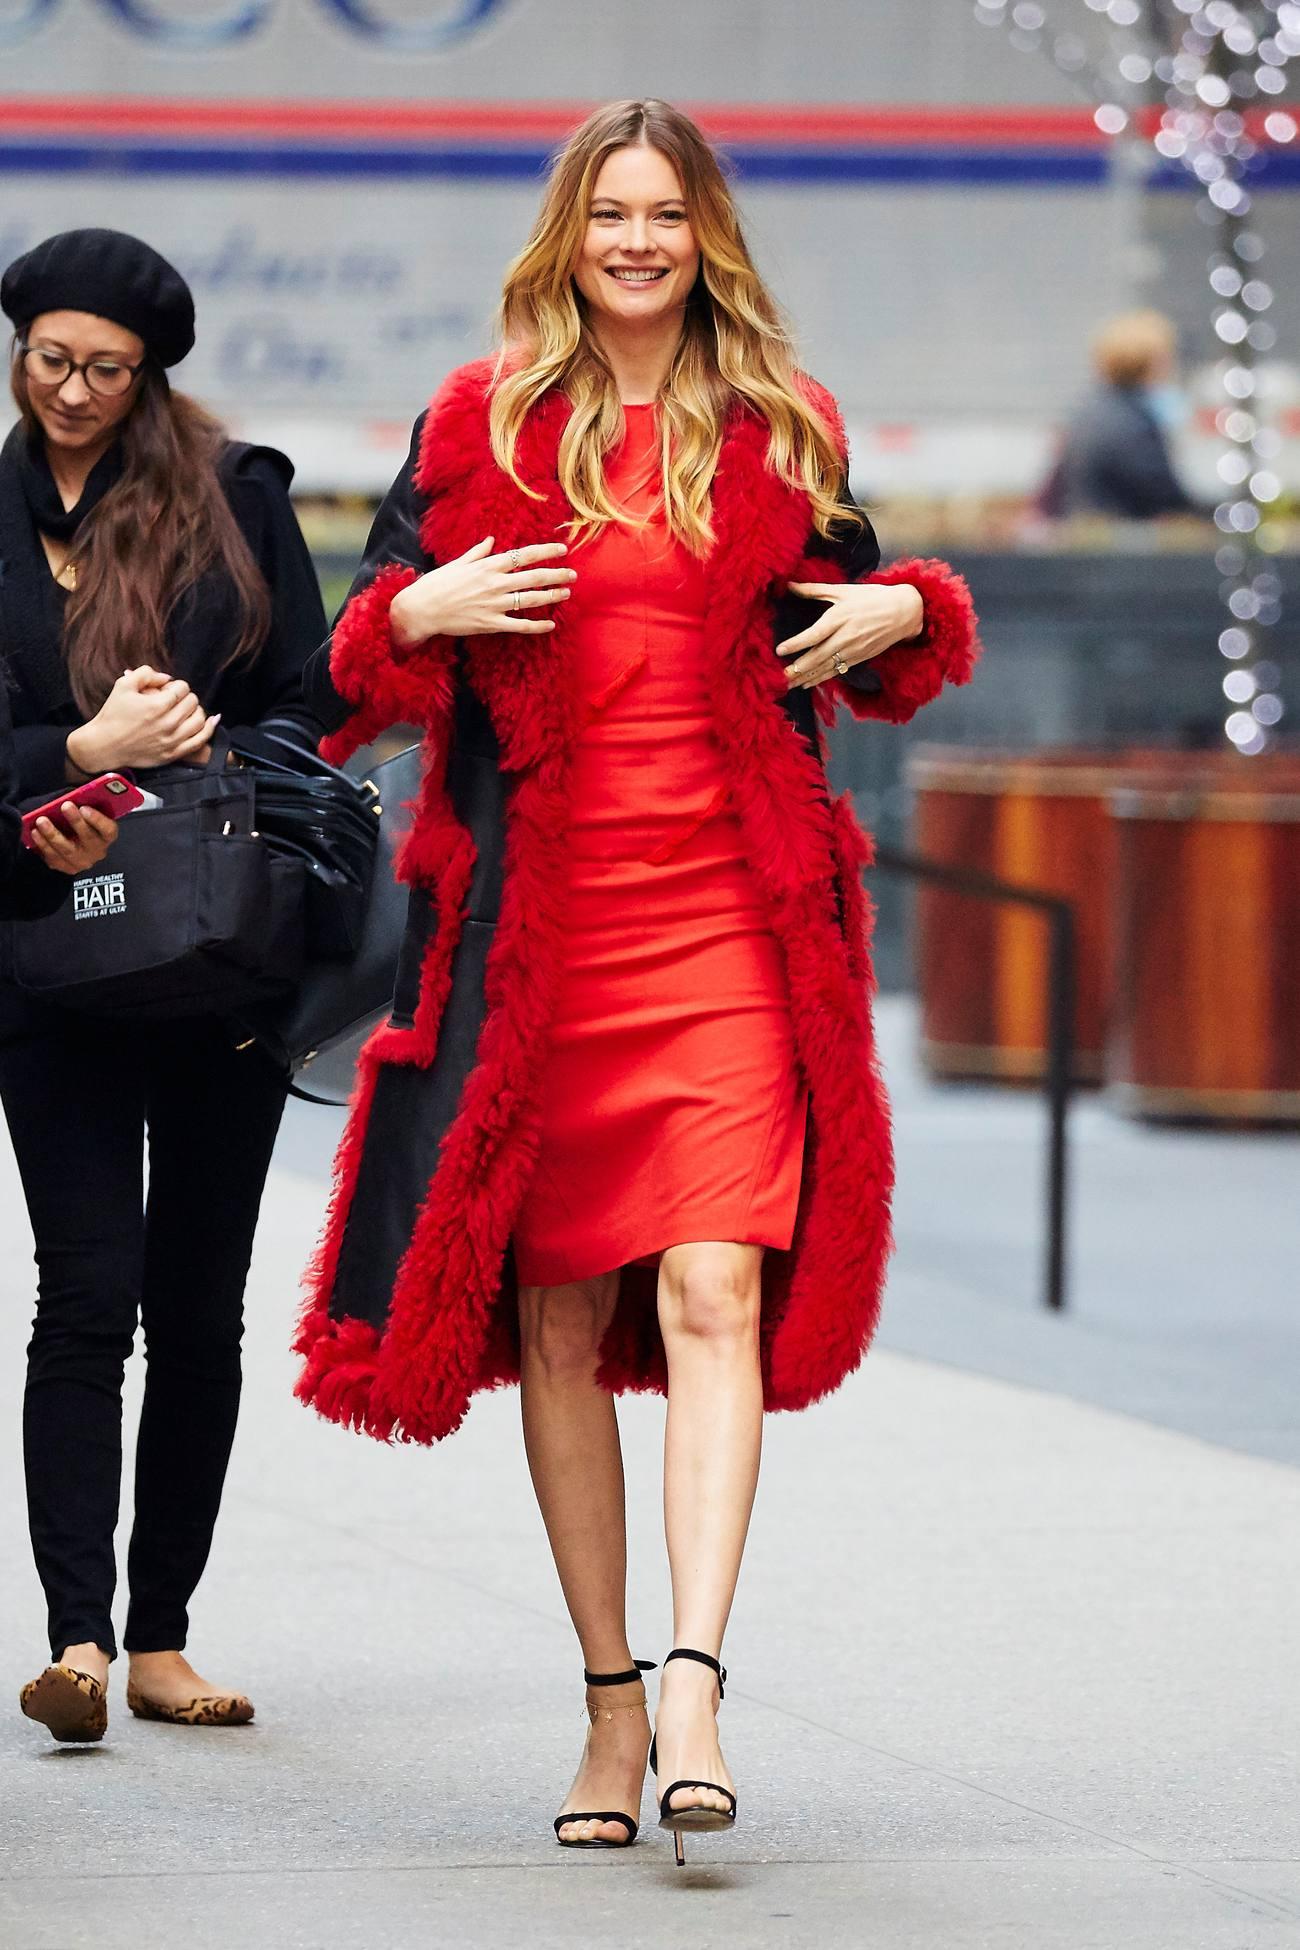 Behati Prinsloo Red Beauty in NYC-4